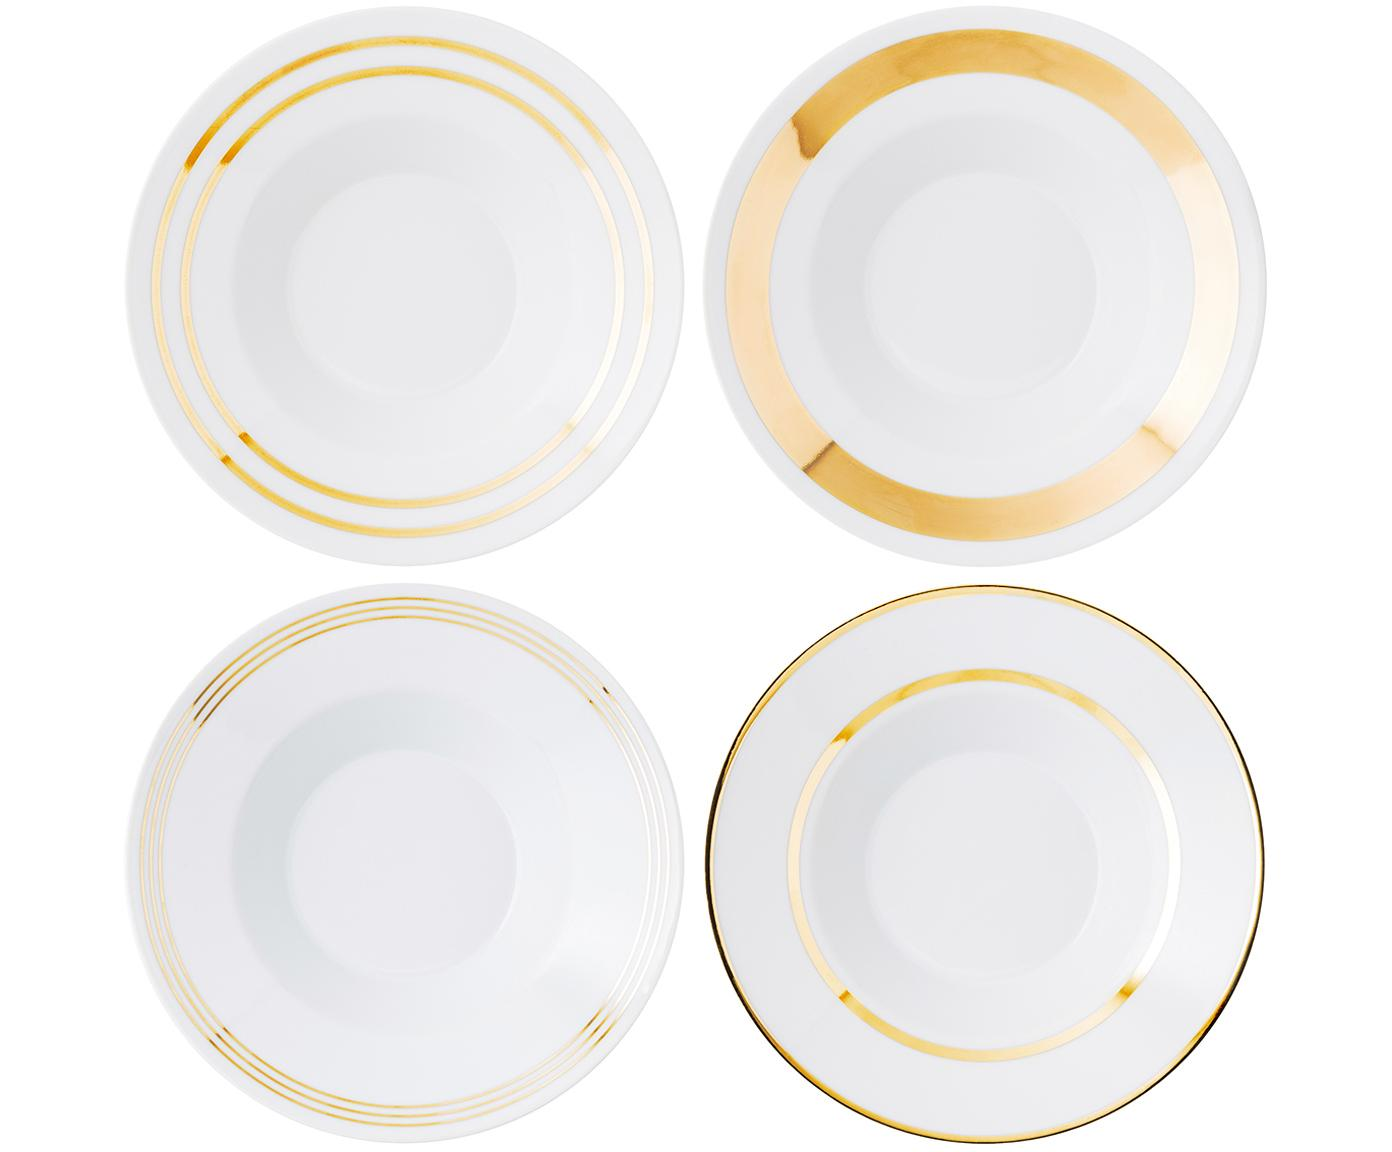 Set piatti fondi Deco 4 pz, Porcellana, Bianco, dorato, Ø 24 x Alt. 10 cm